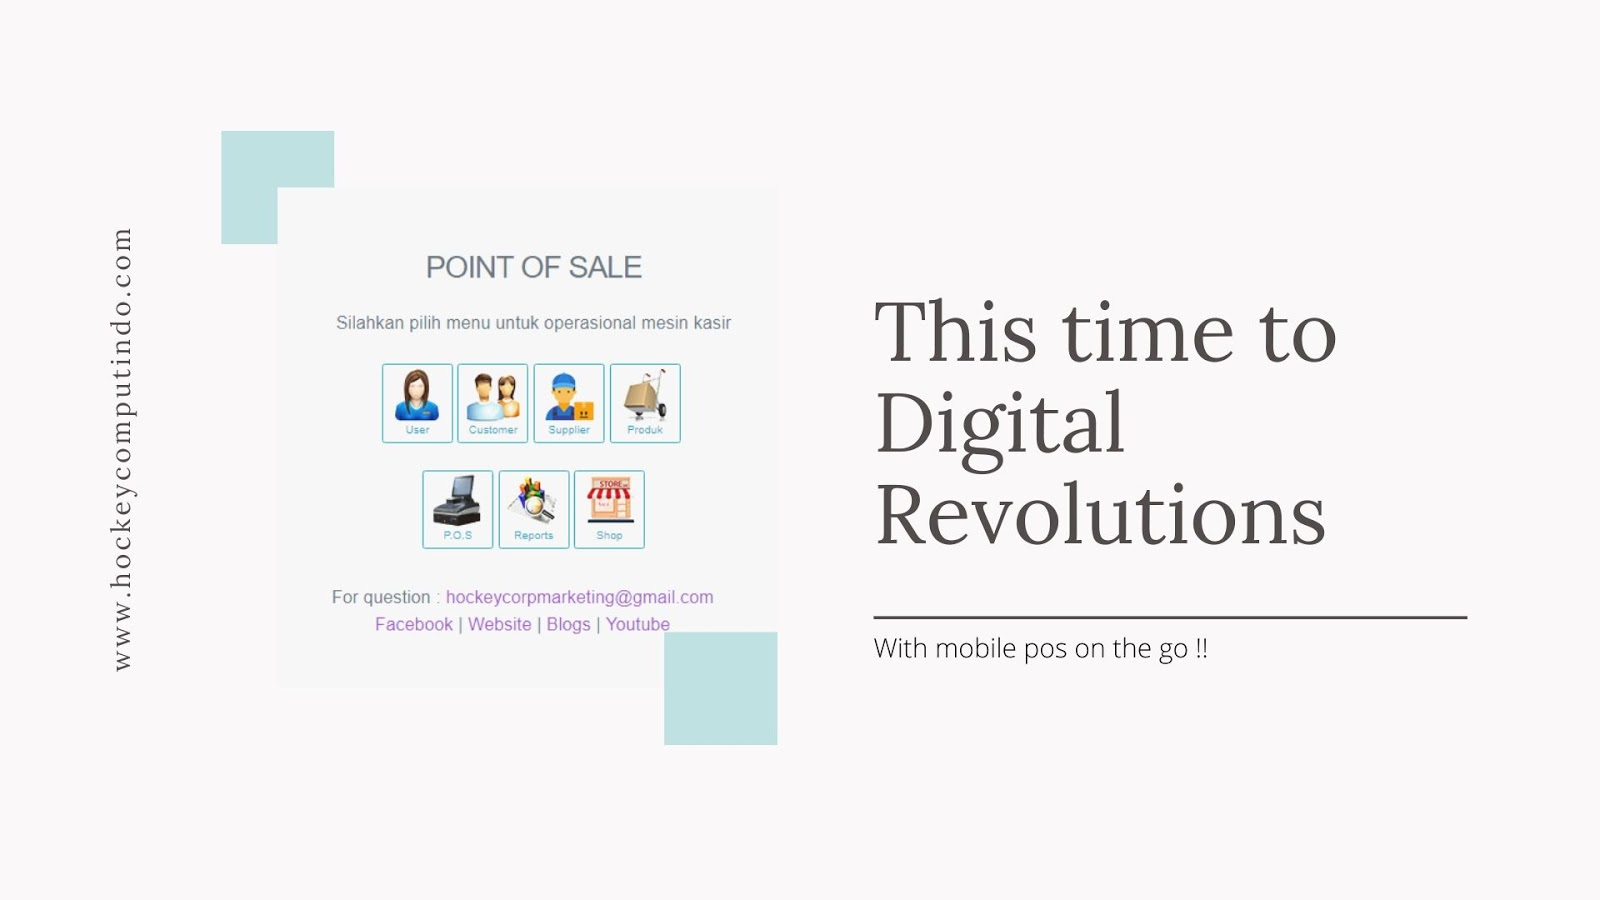 aplikasi kasir online,android,iphone, mesin kasir online